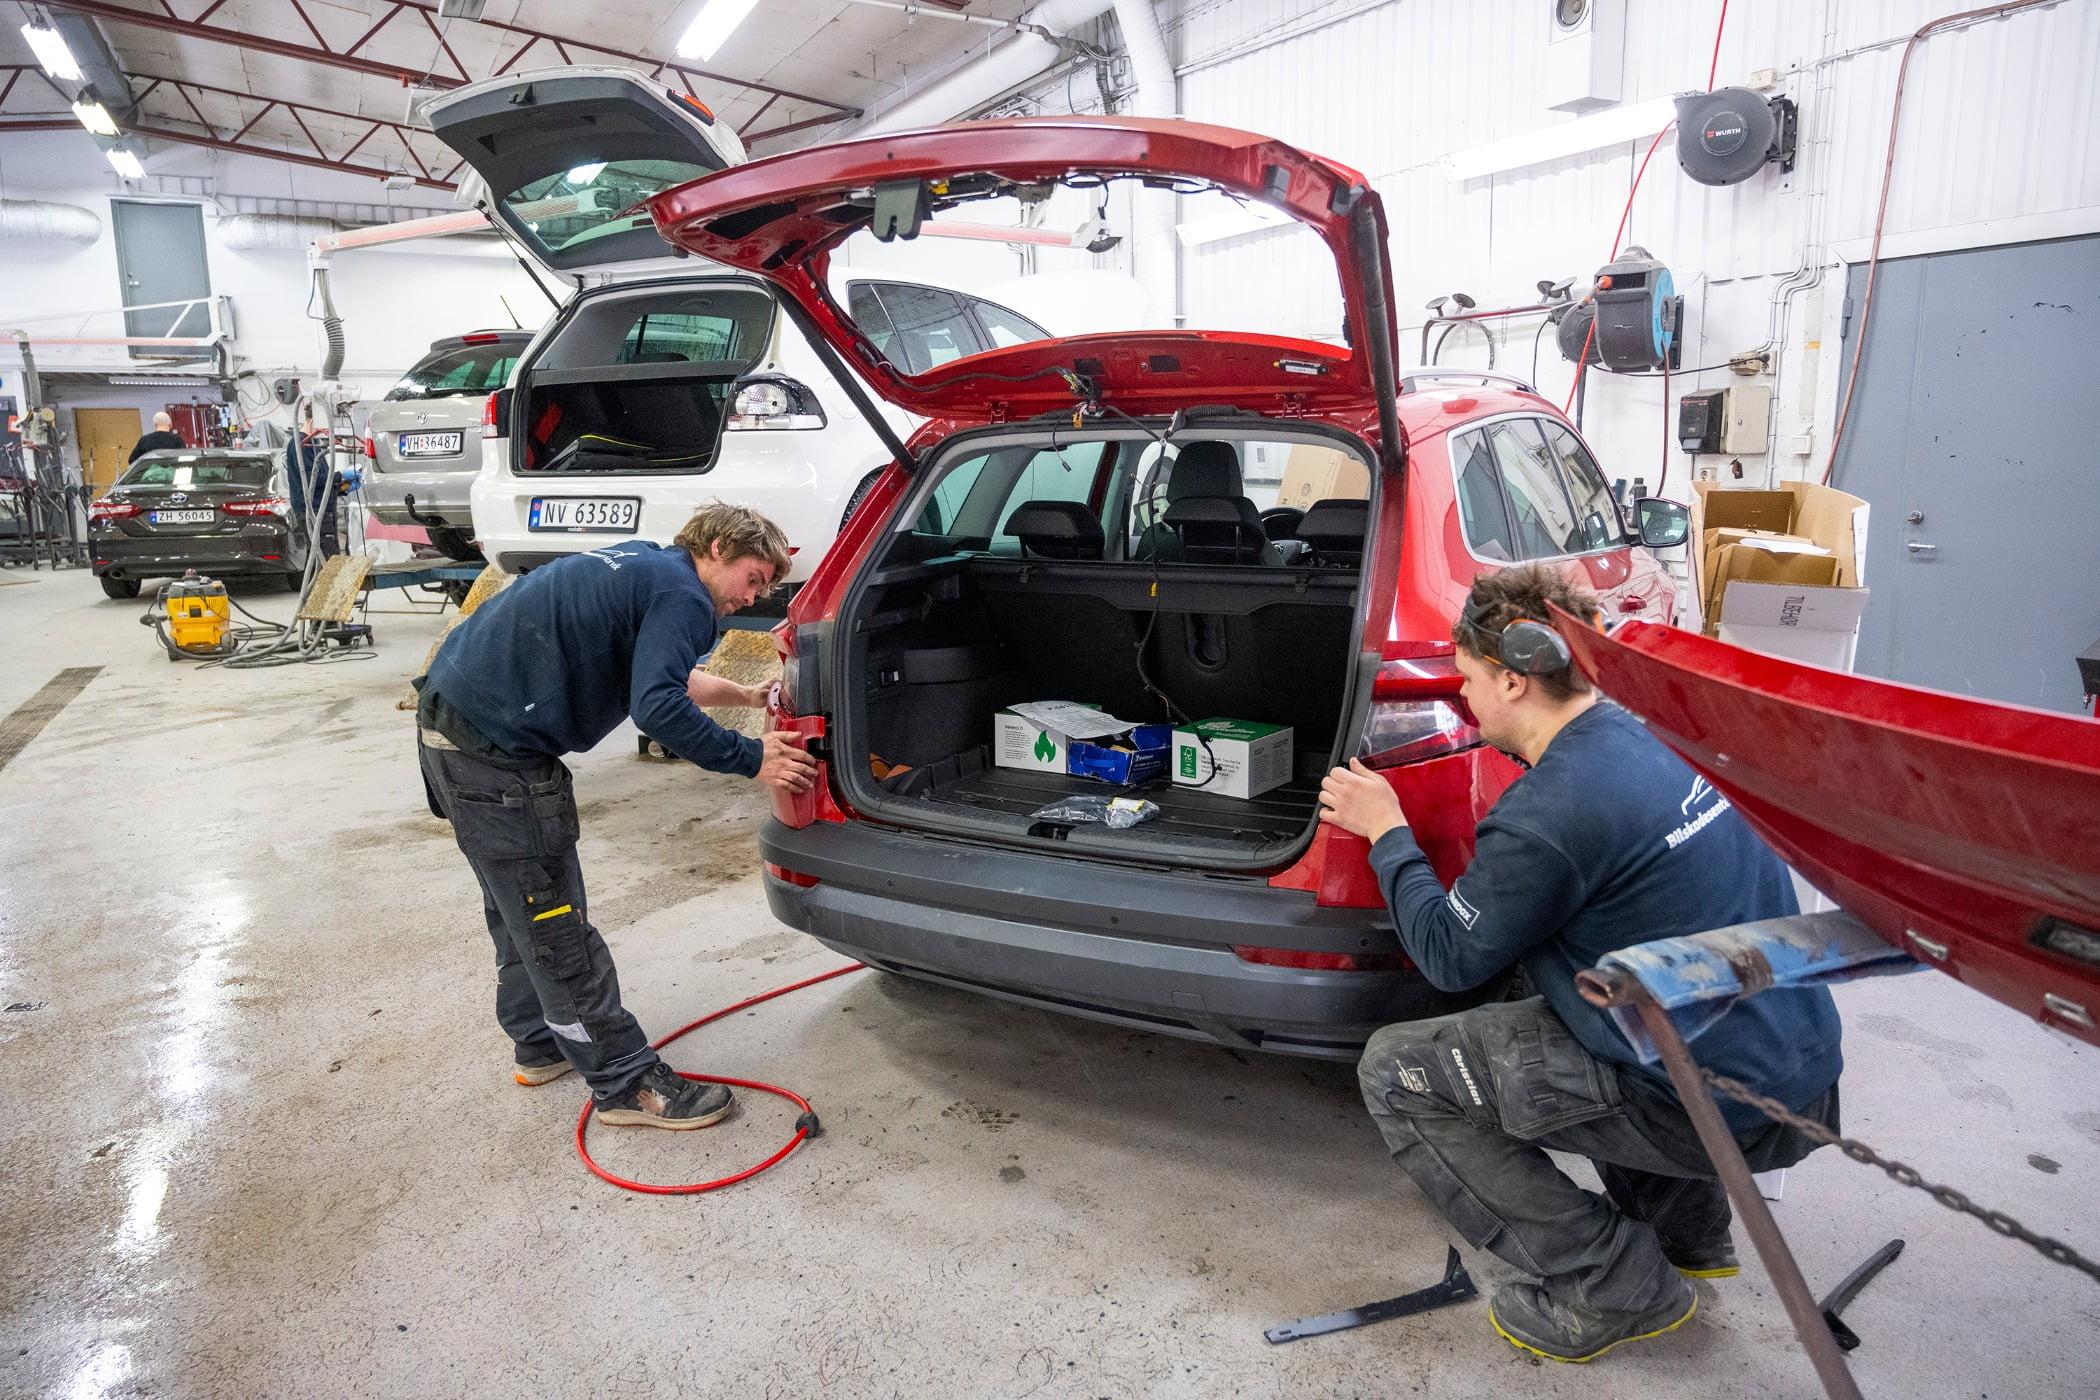 Luggage and bags, Motor vehicle, Automotive tire, Car, Asphalt, Bumper